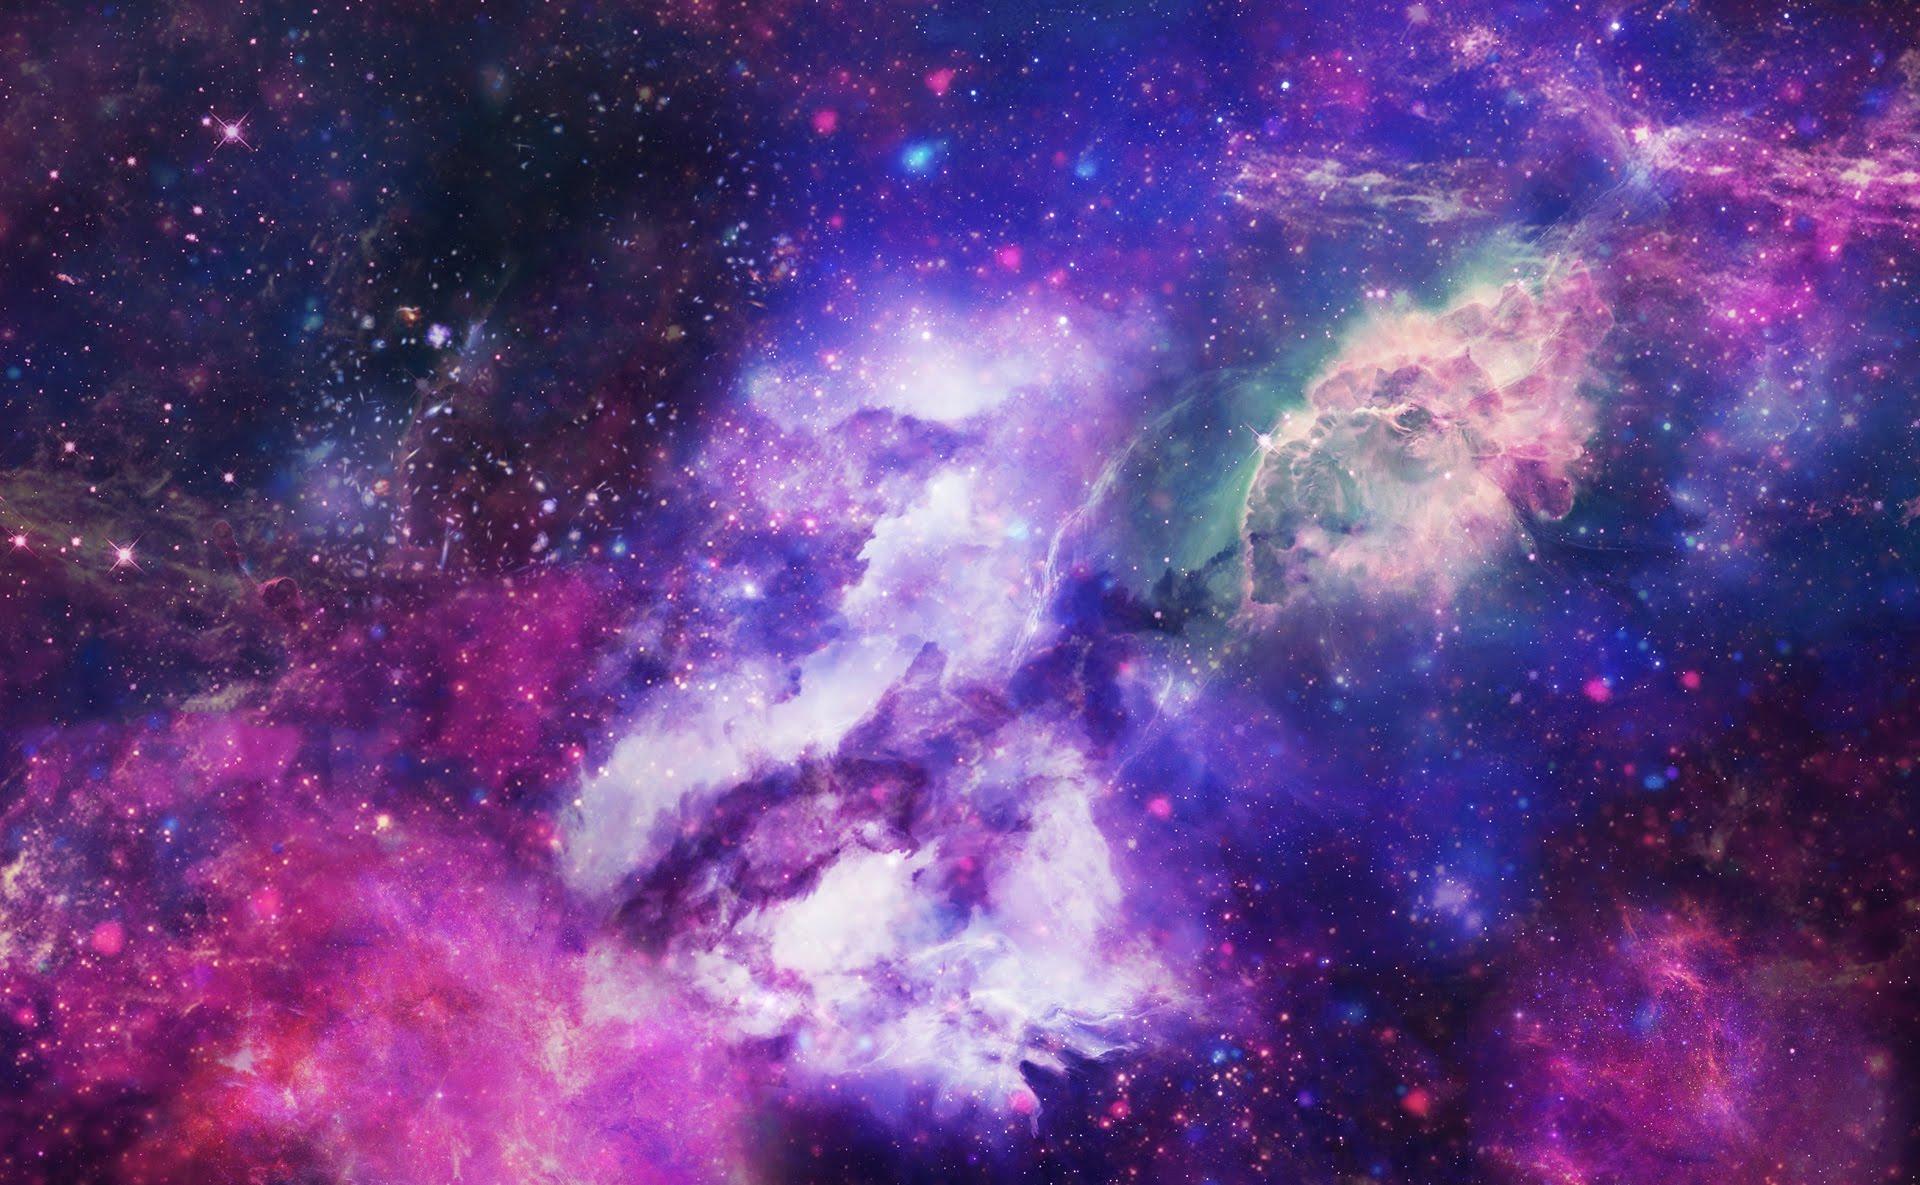 фото космоса рисунки